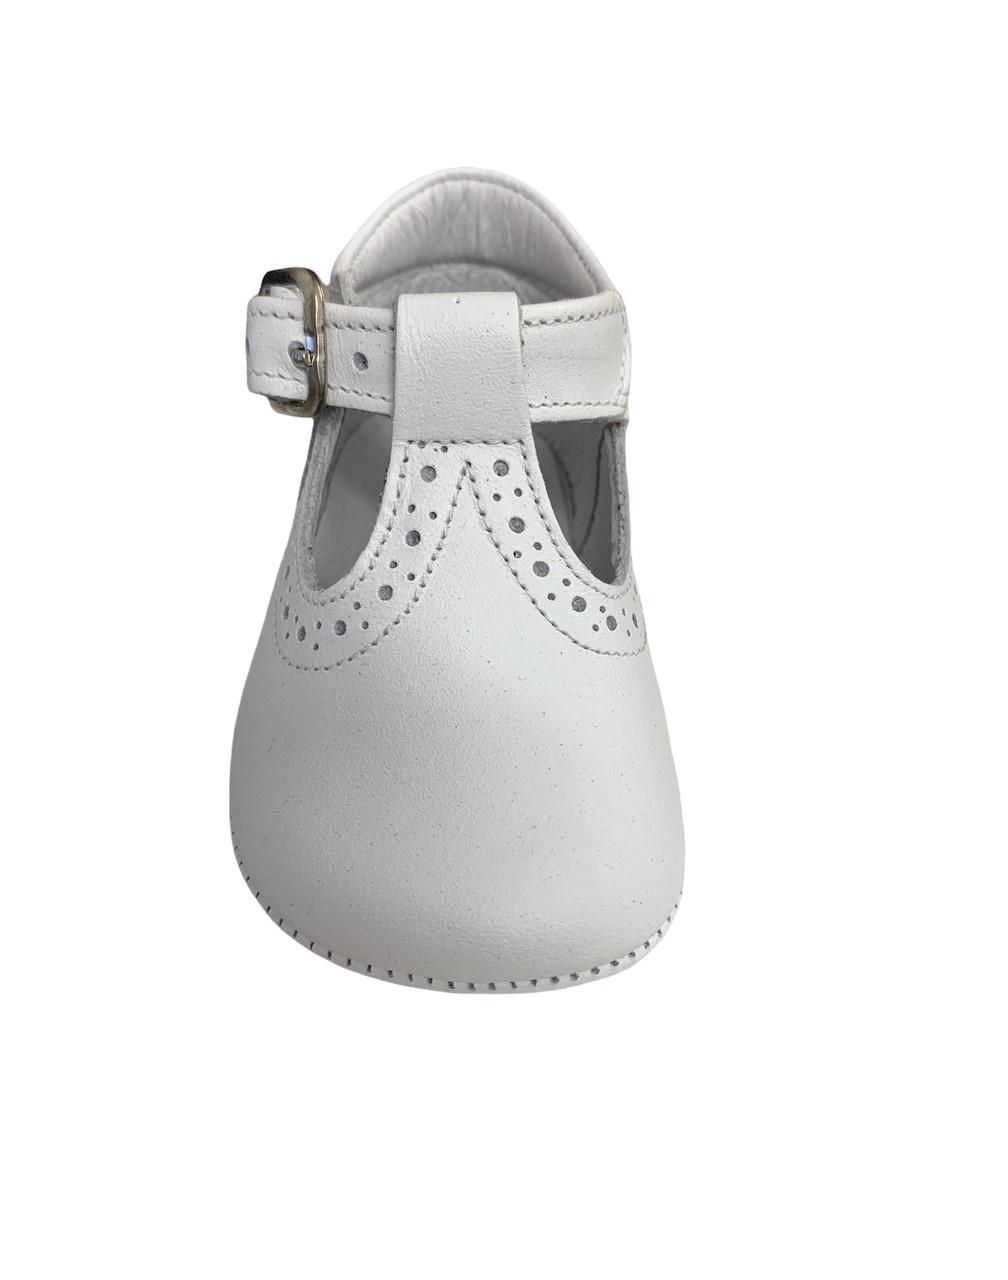 Andanines Andanines White Leather Pram Shoe 202801